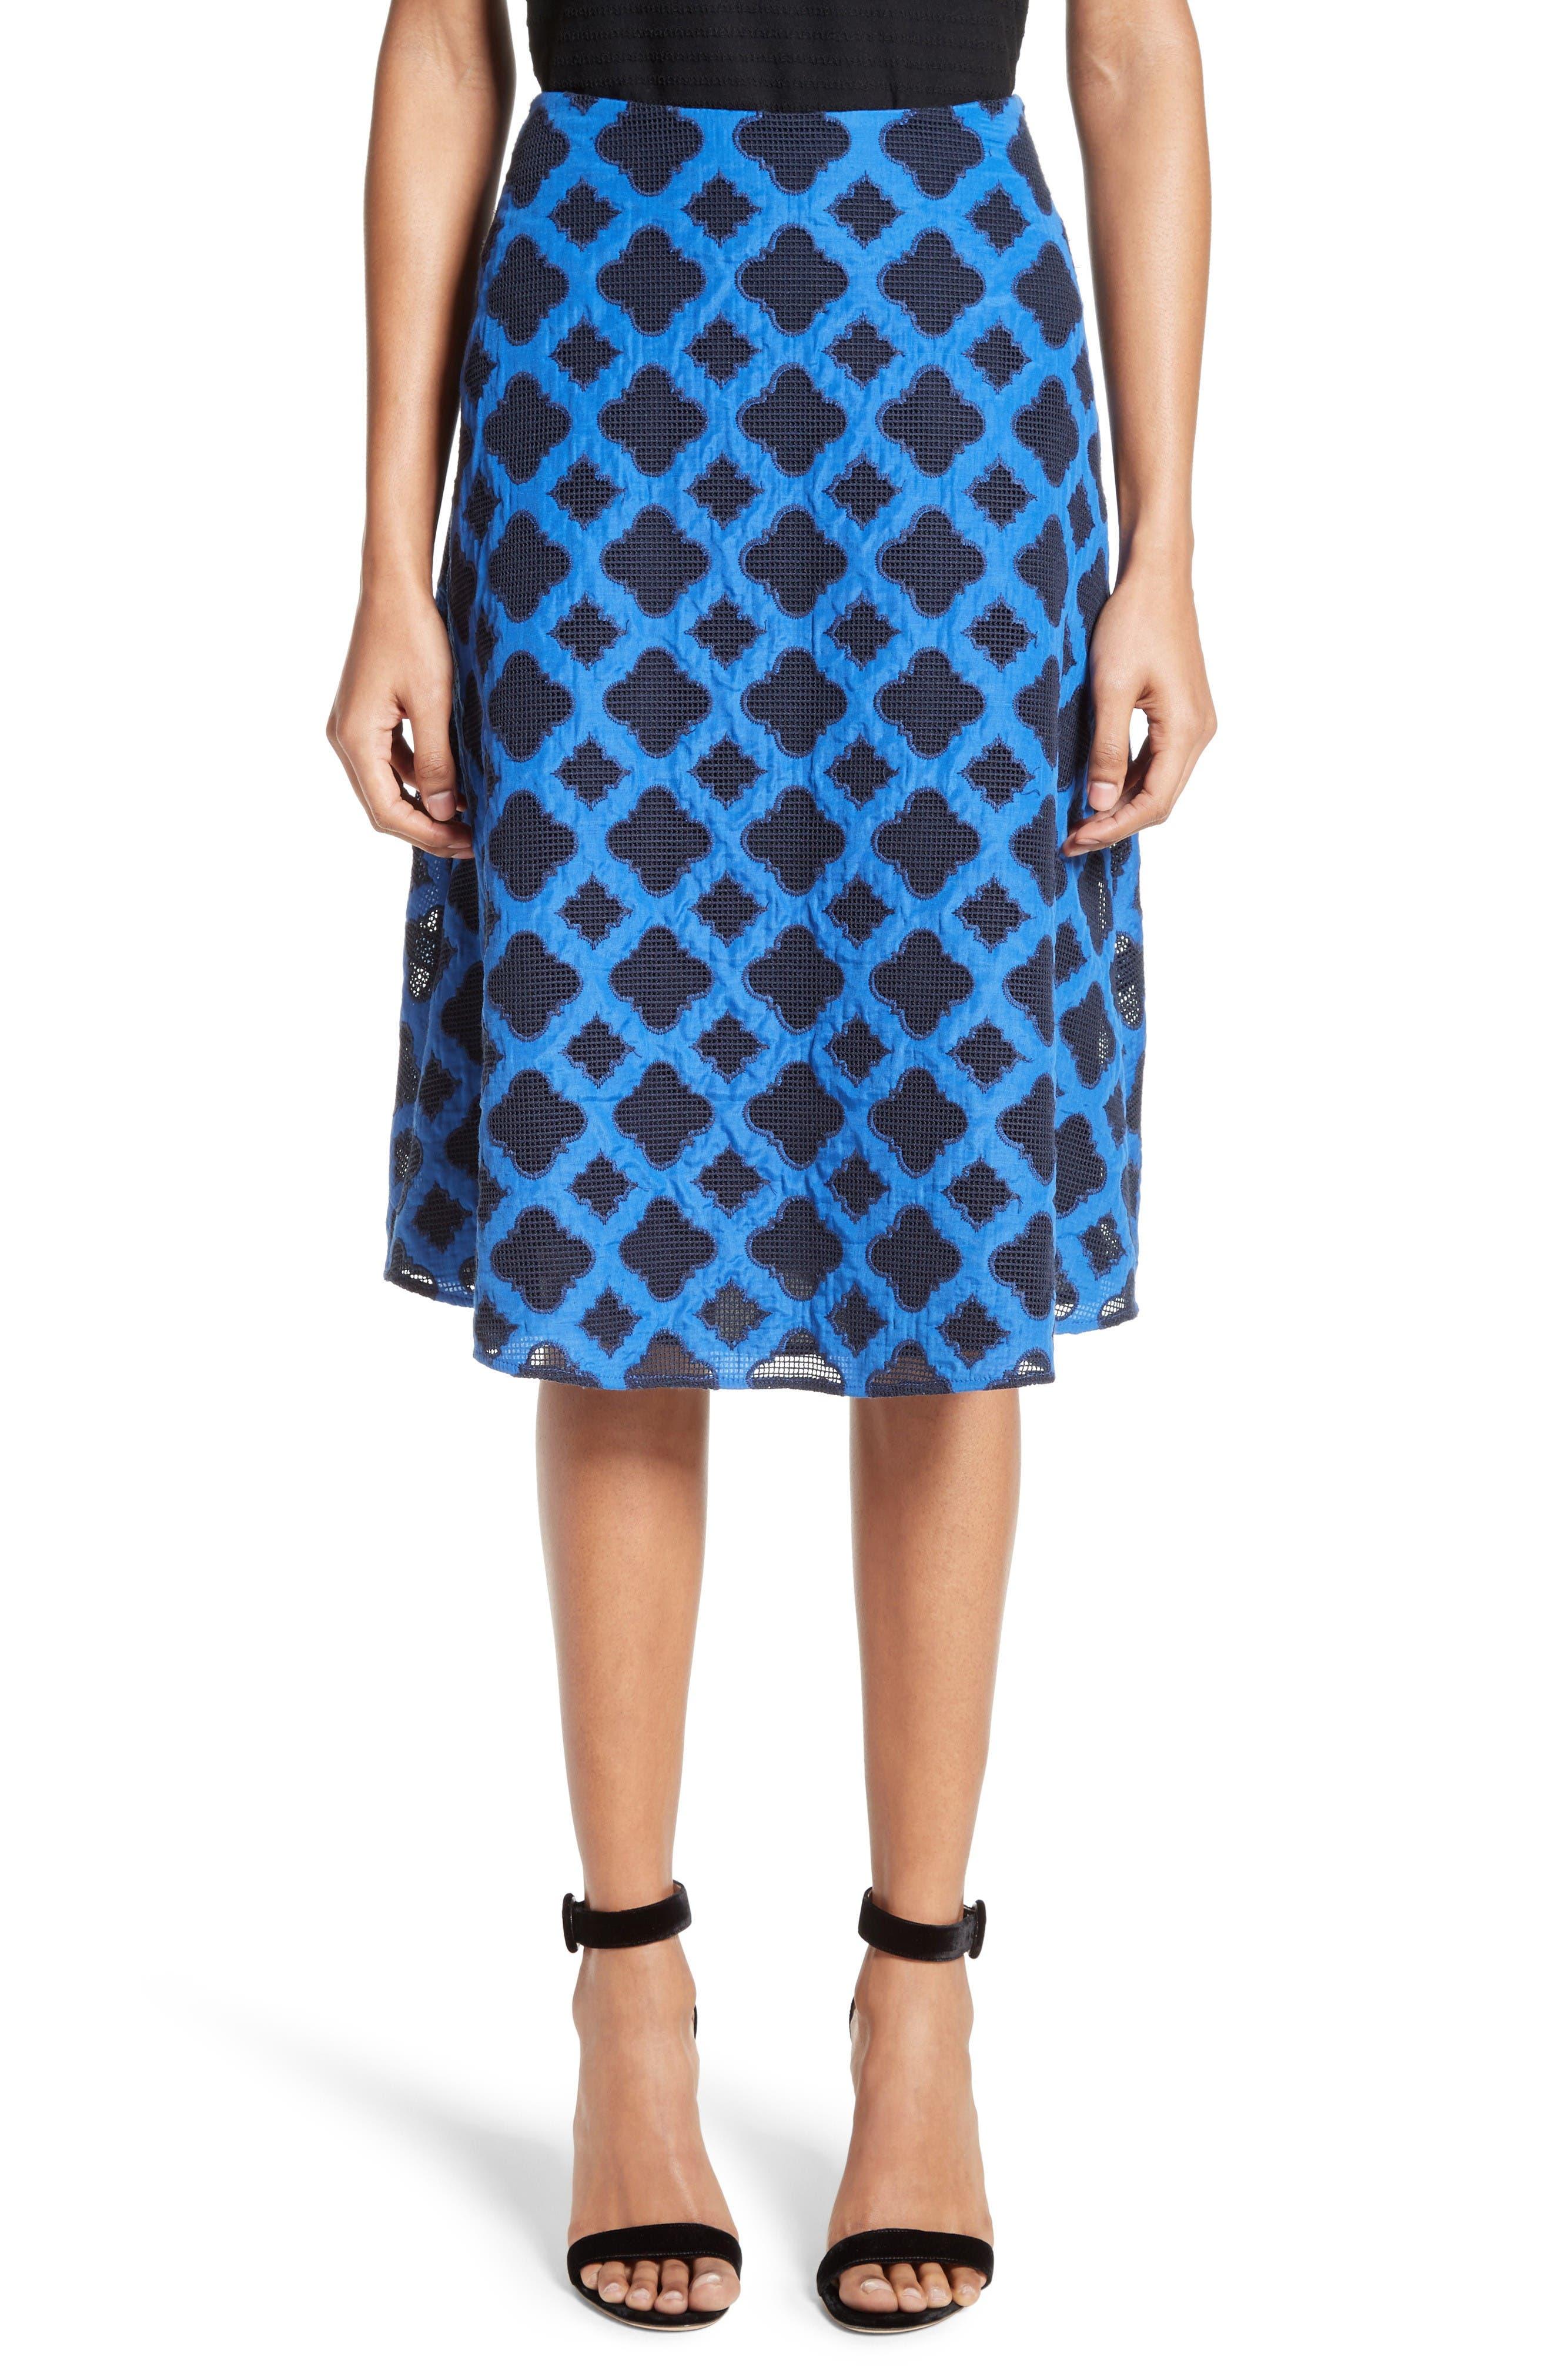 St. John Collection Aksana Geo Embroidered Mesh Skirt